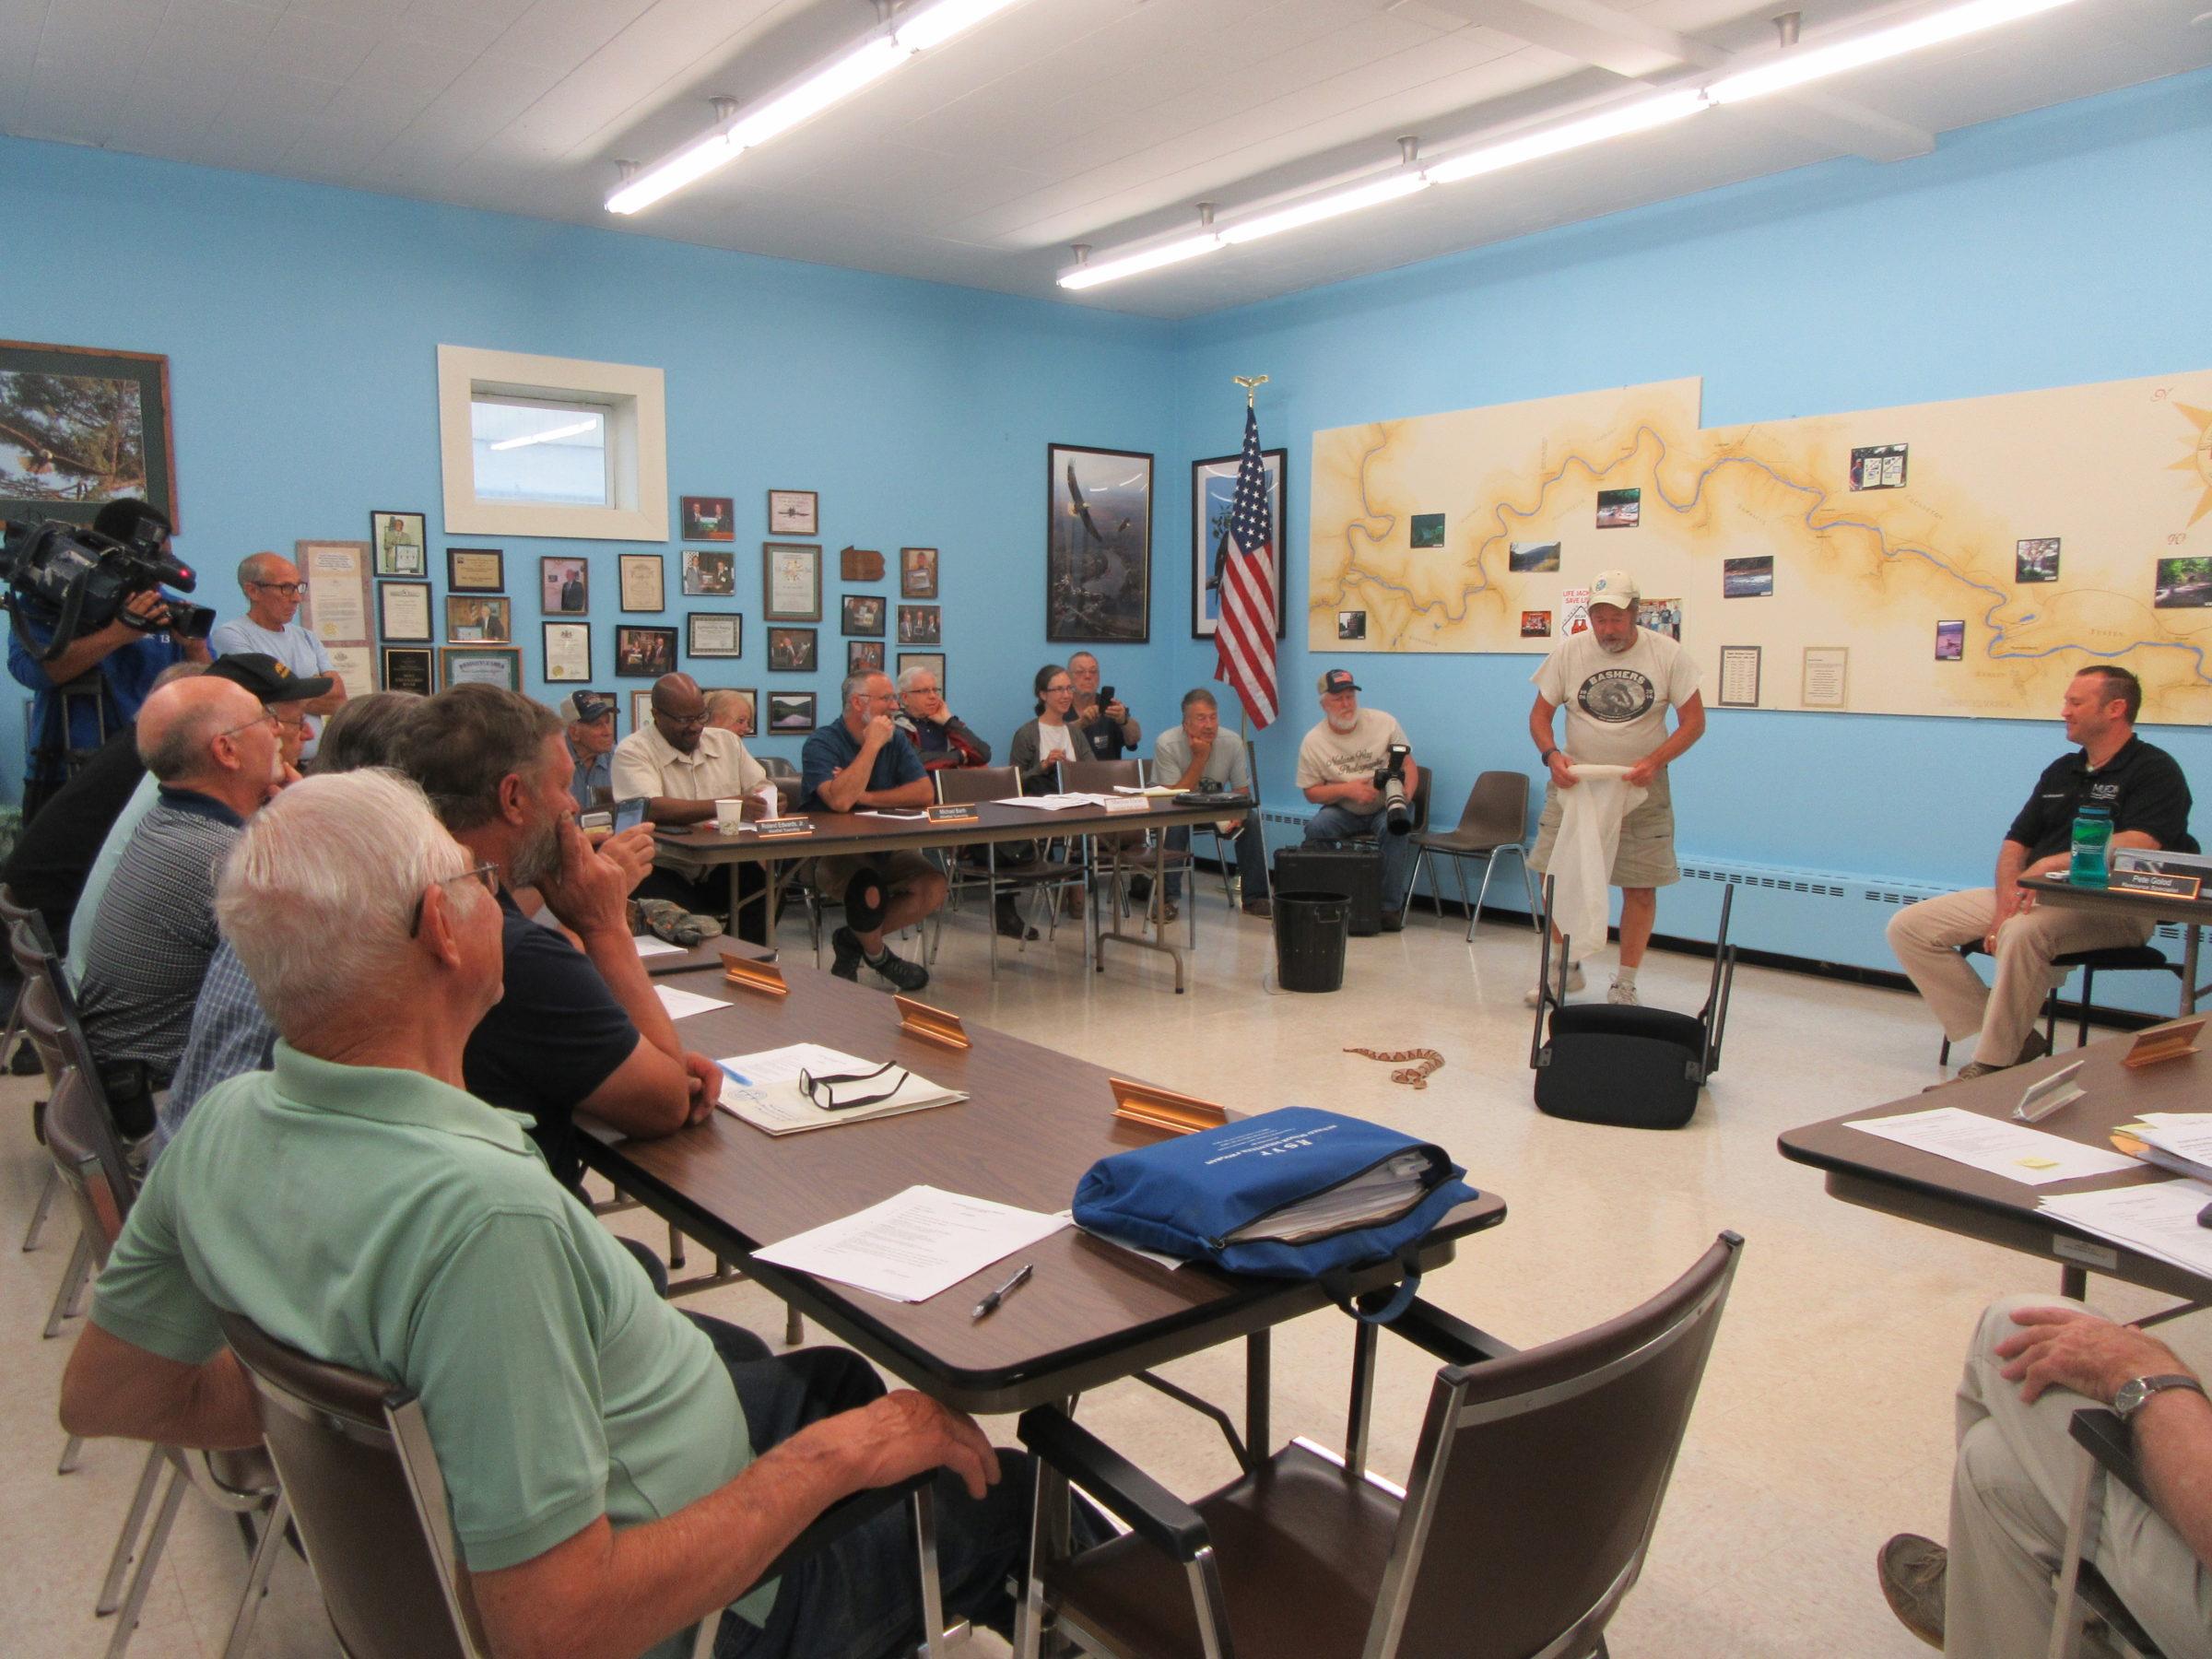 Randy Stechert Habits and Habitats of Venomous Snakes presentation